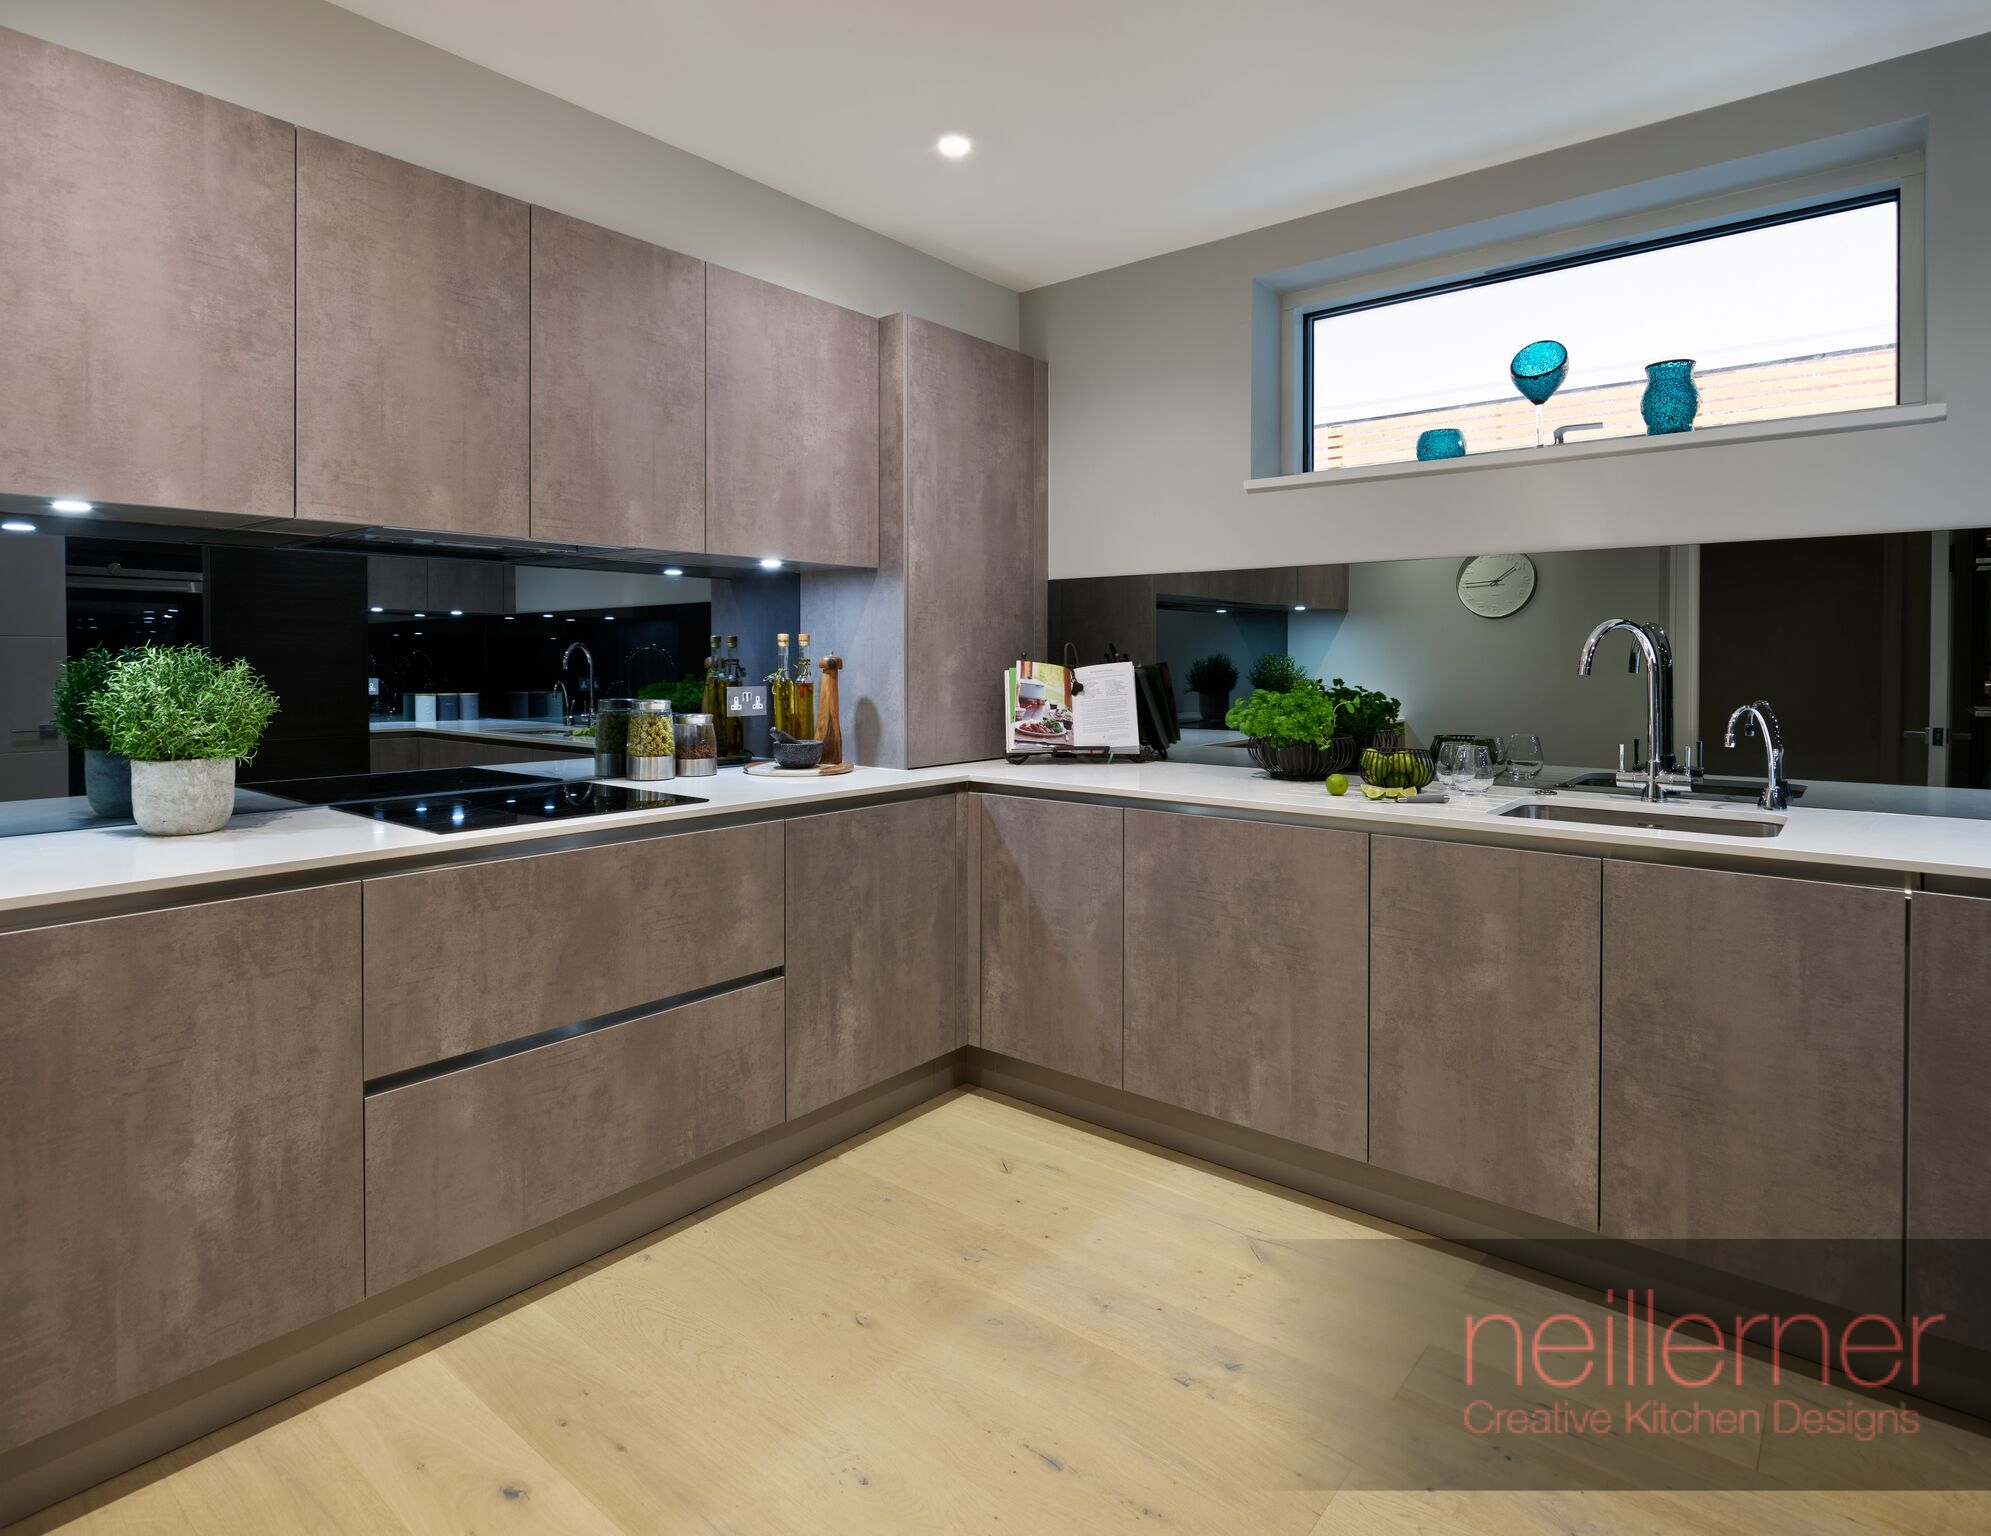 Contract Kitchen Developments - Neil Lerner Designs